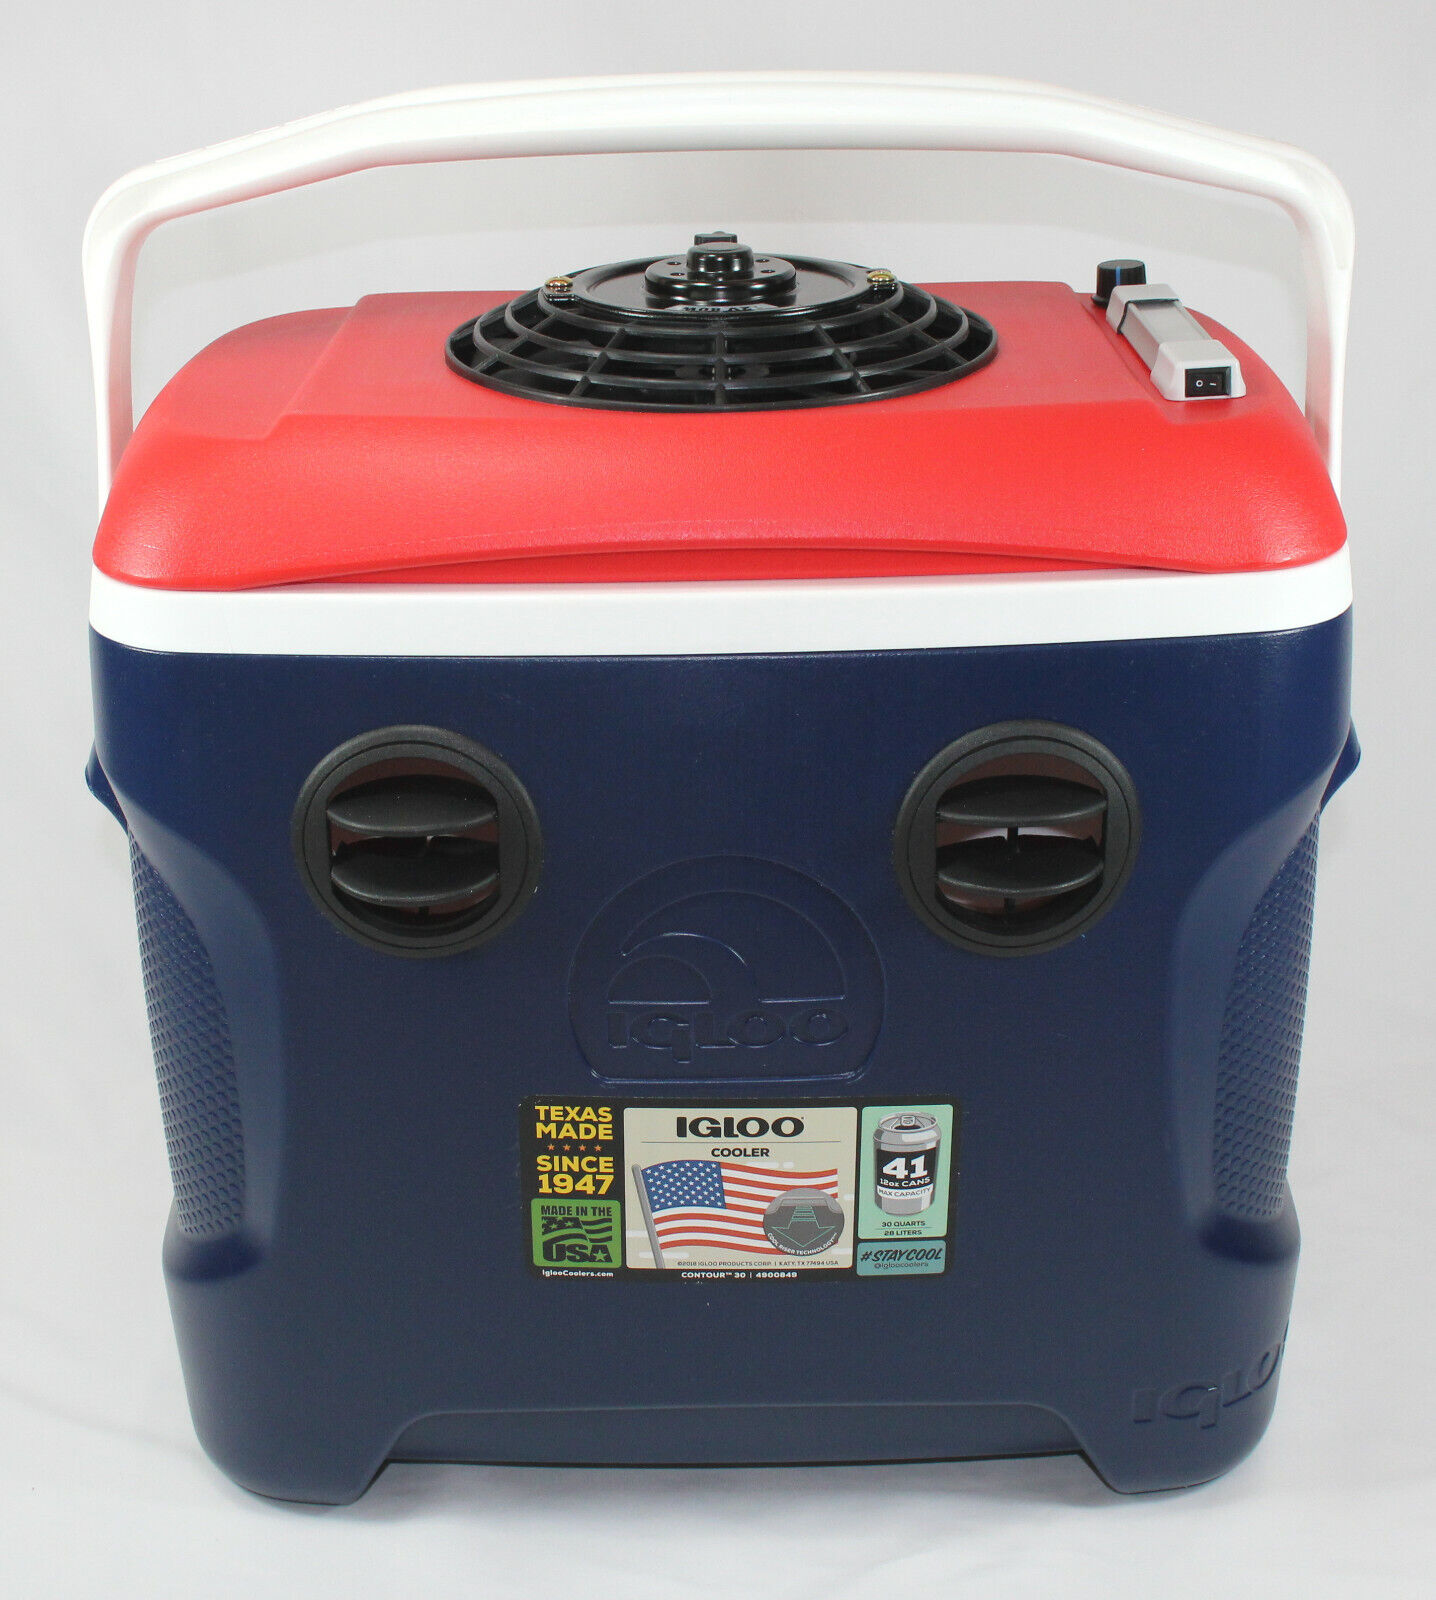 12v portable air conditioner cooler 30 quart